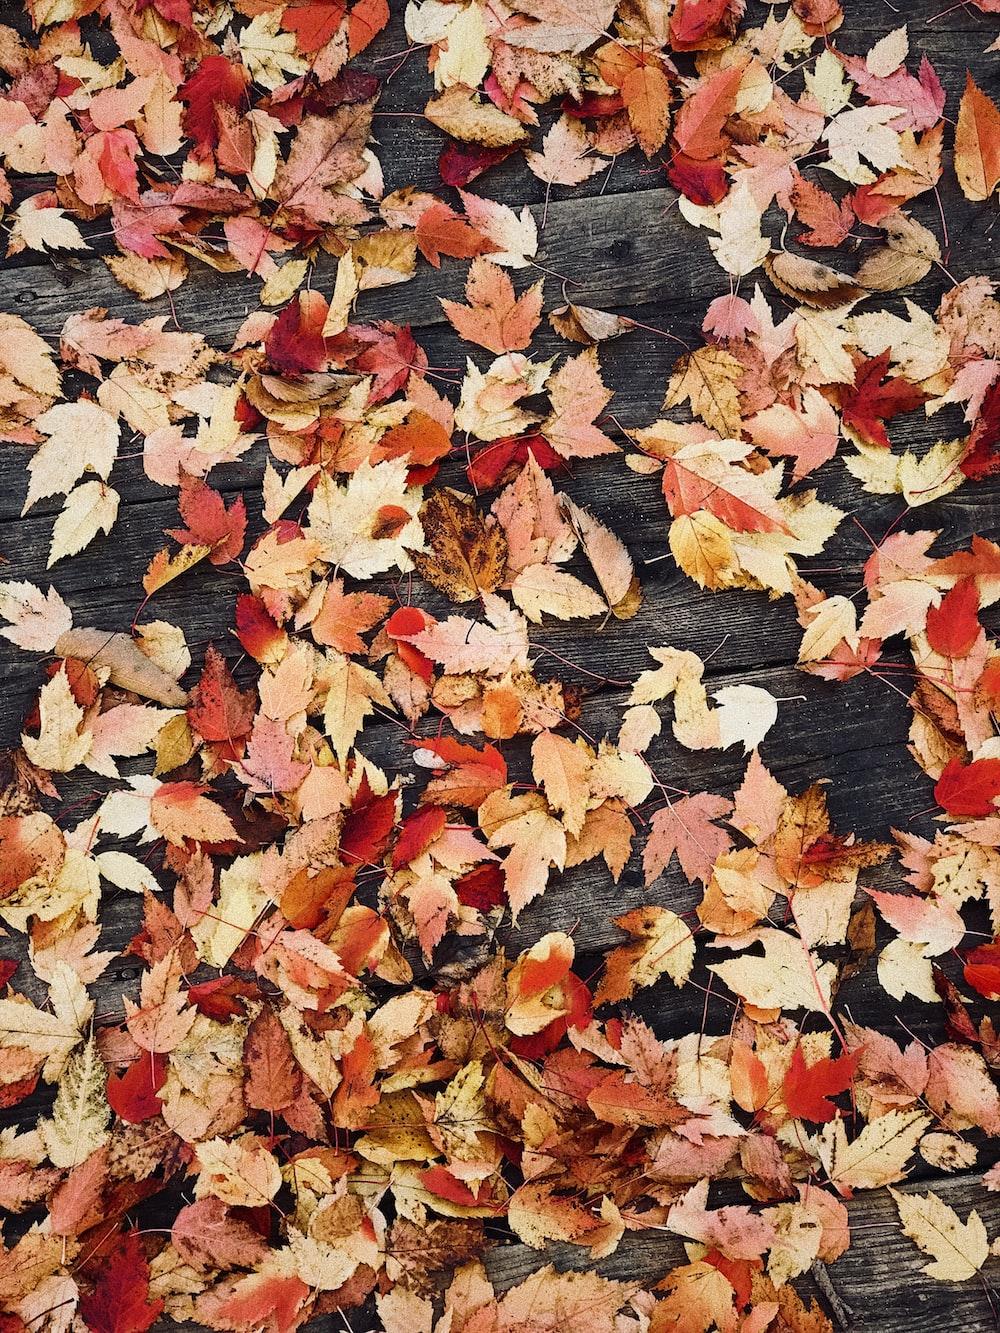 autumn images download free images on unsplash